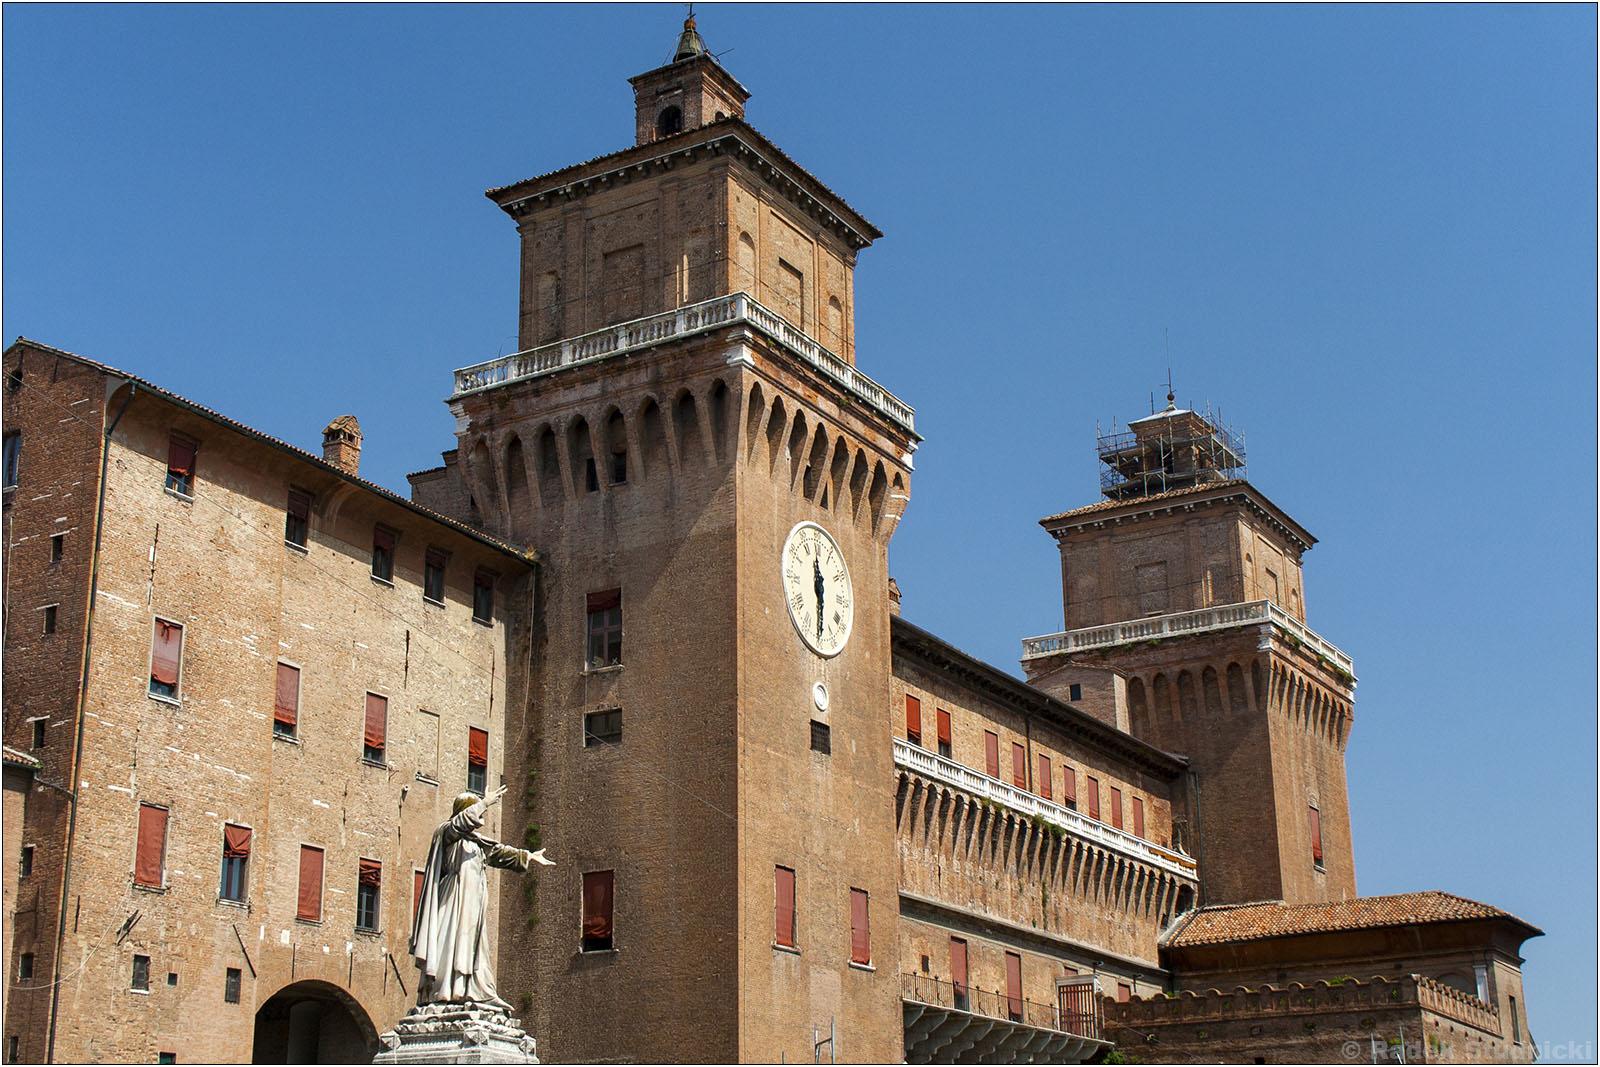 Ferrara: Castello Estense